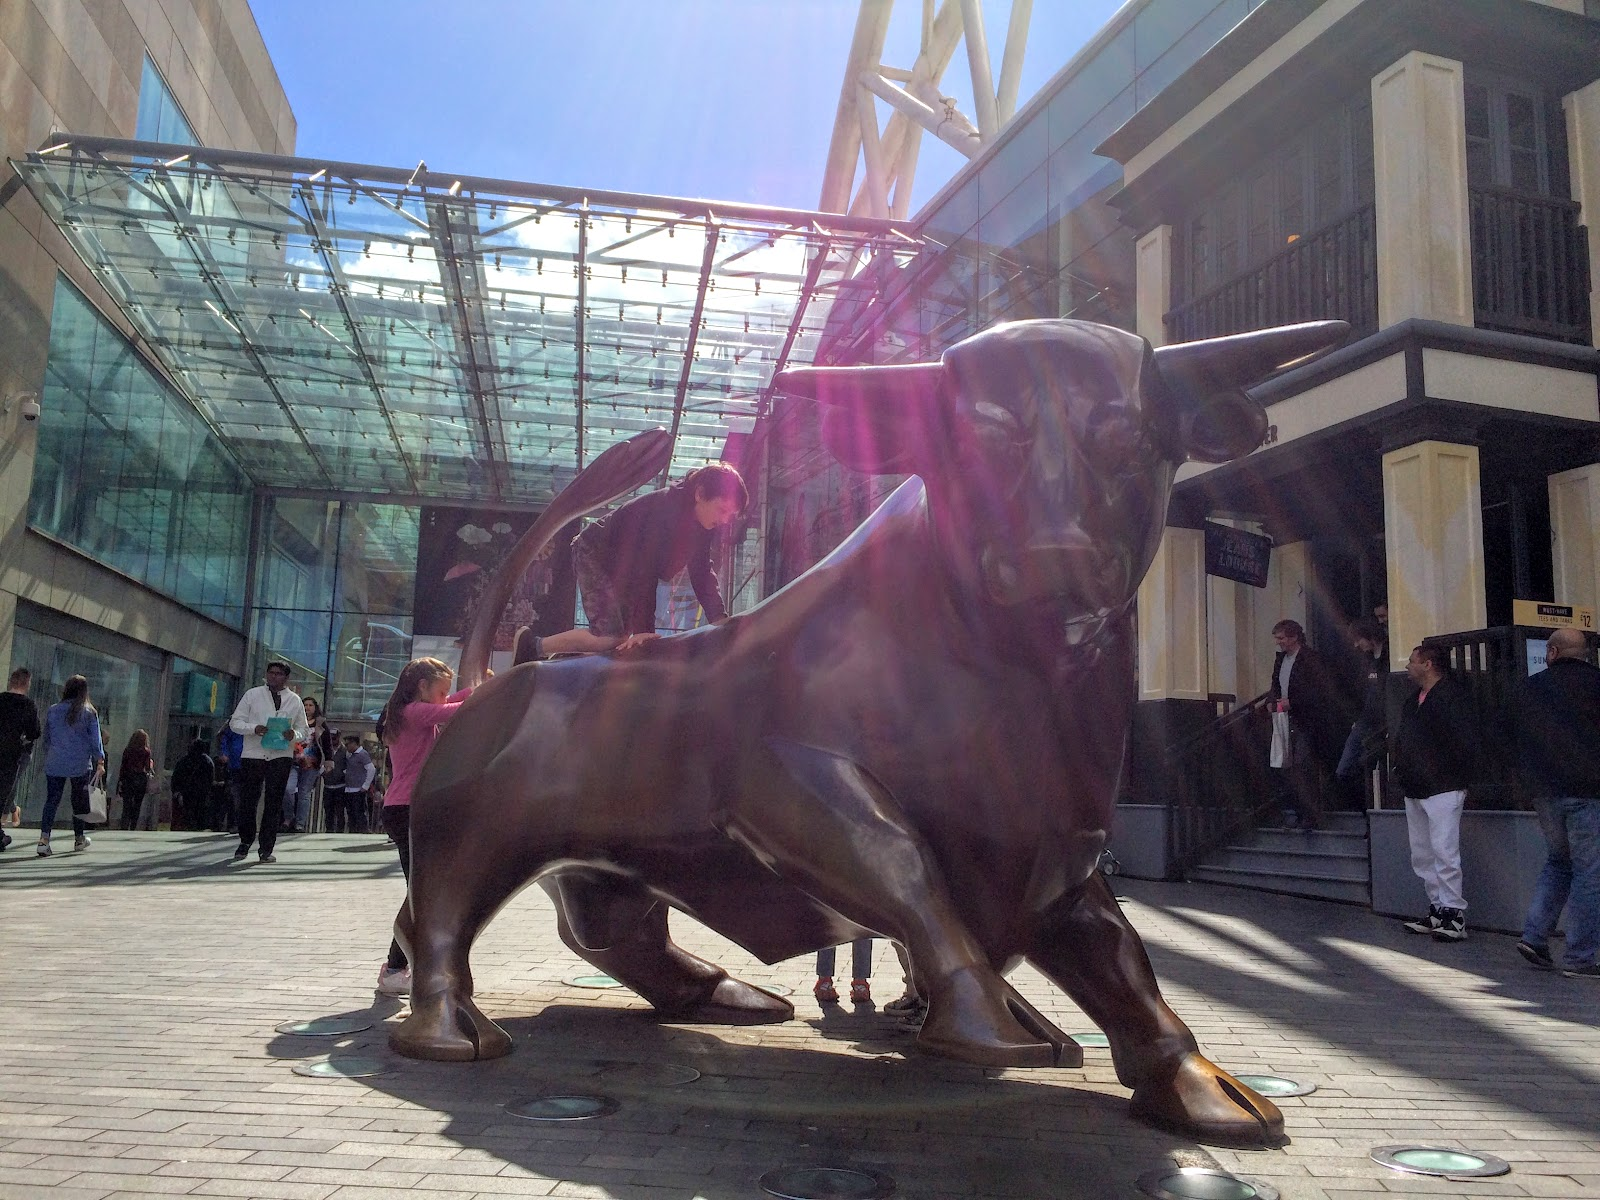 The Bull, The Bullring, Birmingham City Centre